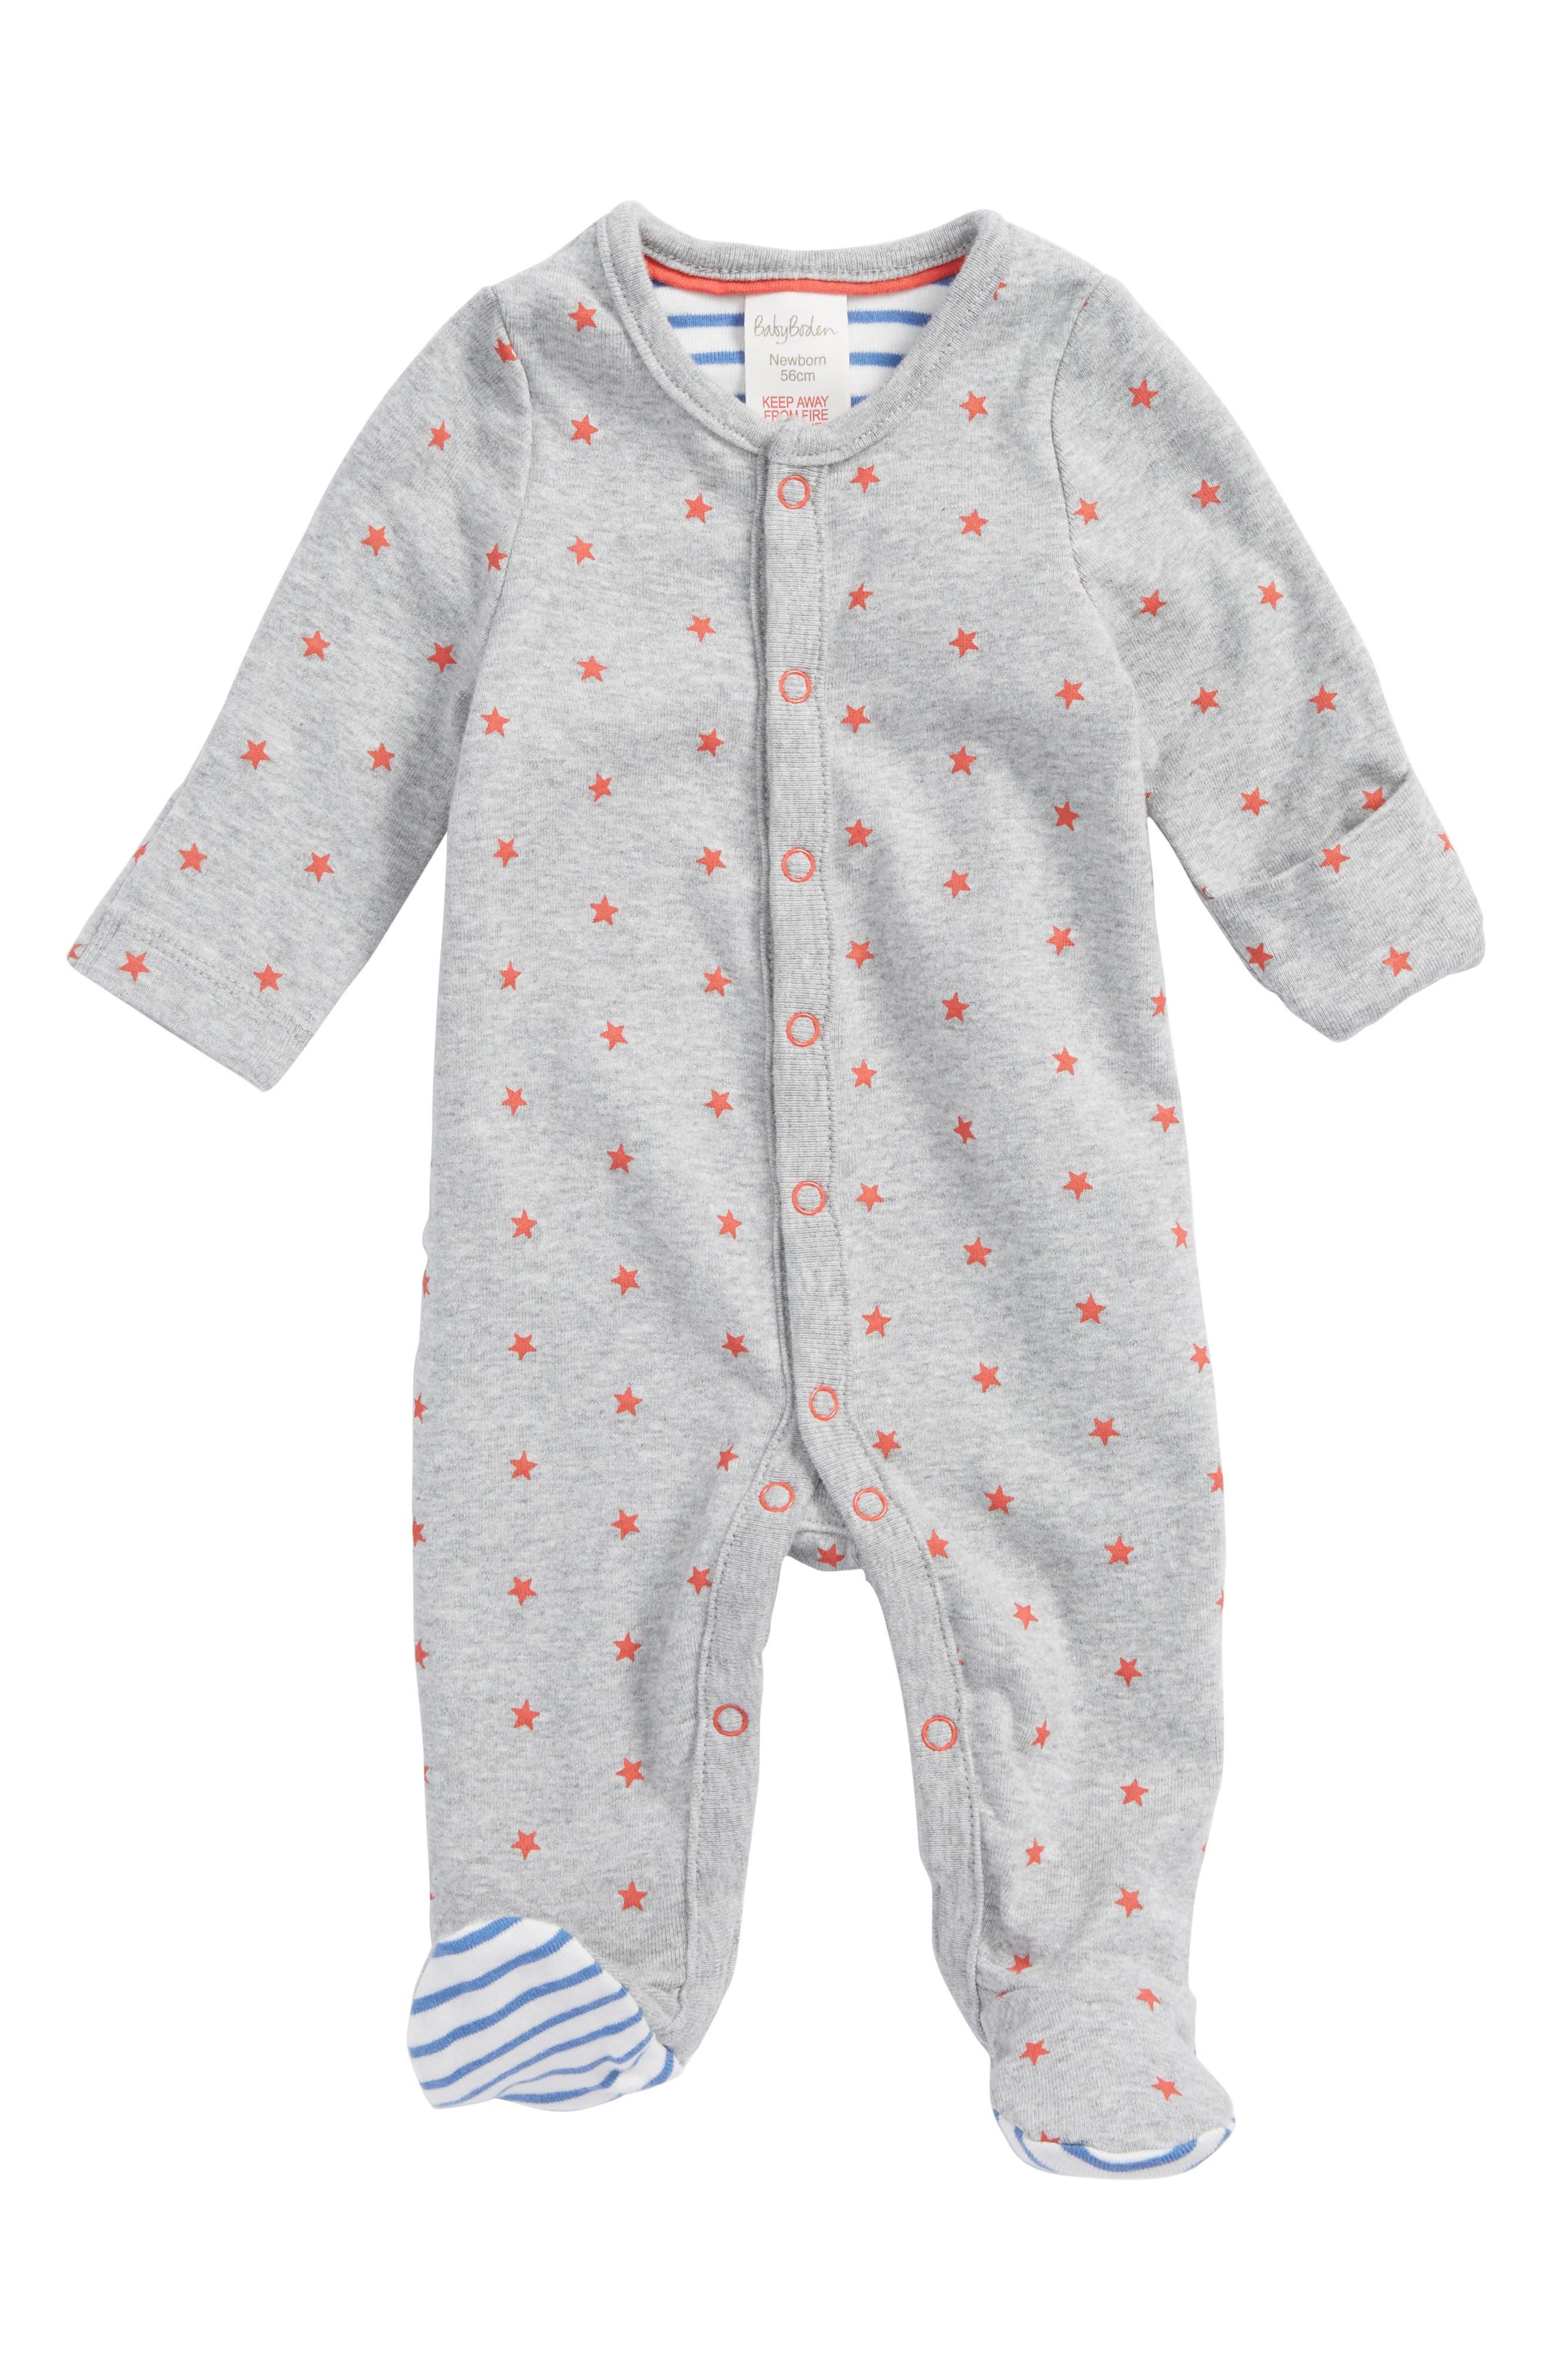 Print Organic Cotton One-Piece Pajamas,                             Main thumbnail 1, color,                             062